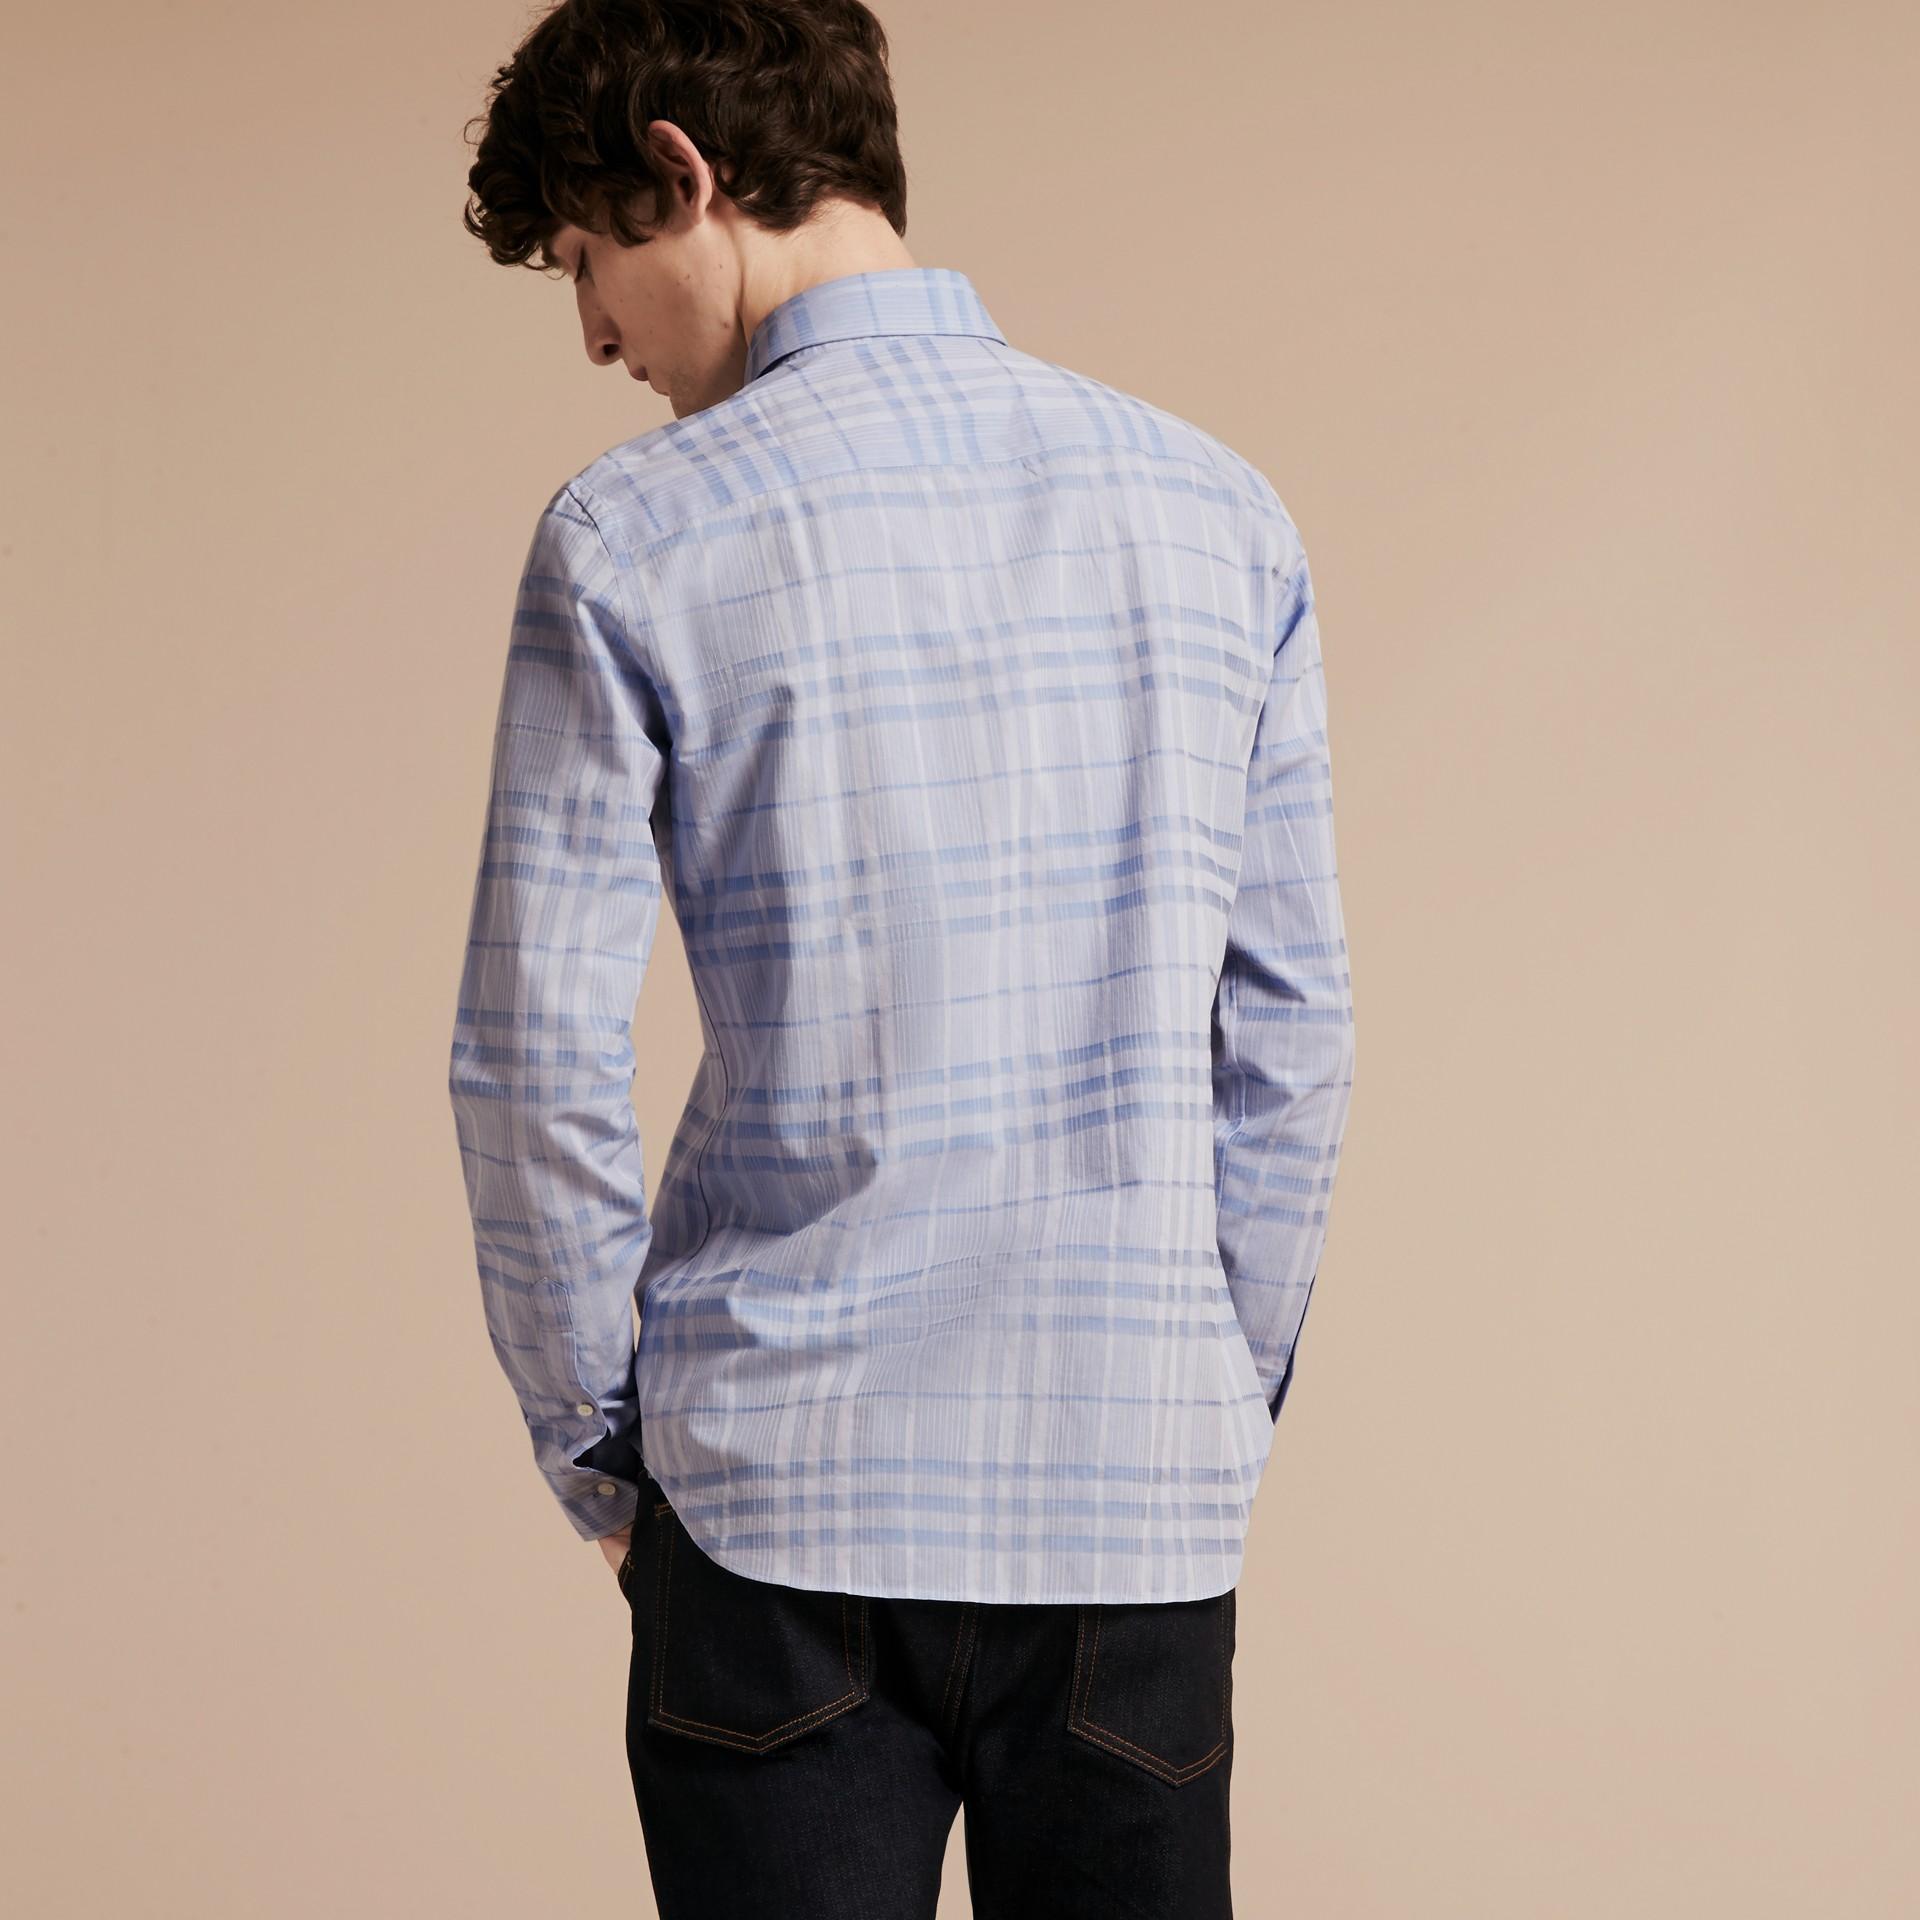 City blue Check Jacquard Cotton Shirt City Blue - gallery image 3